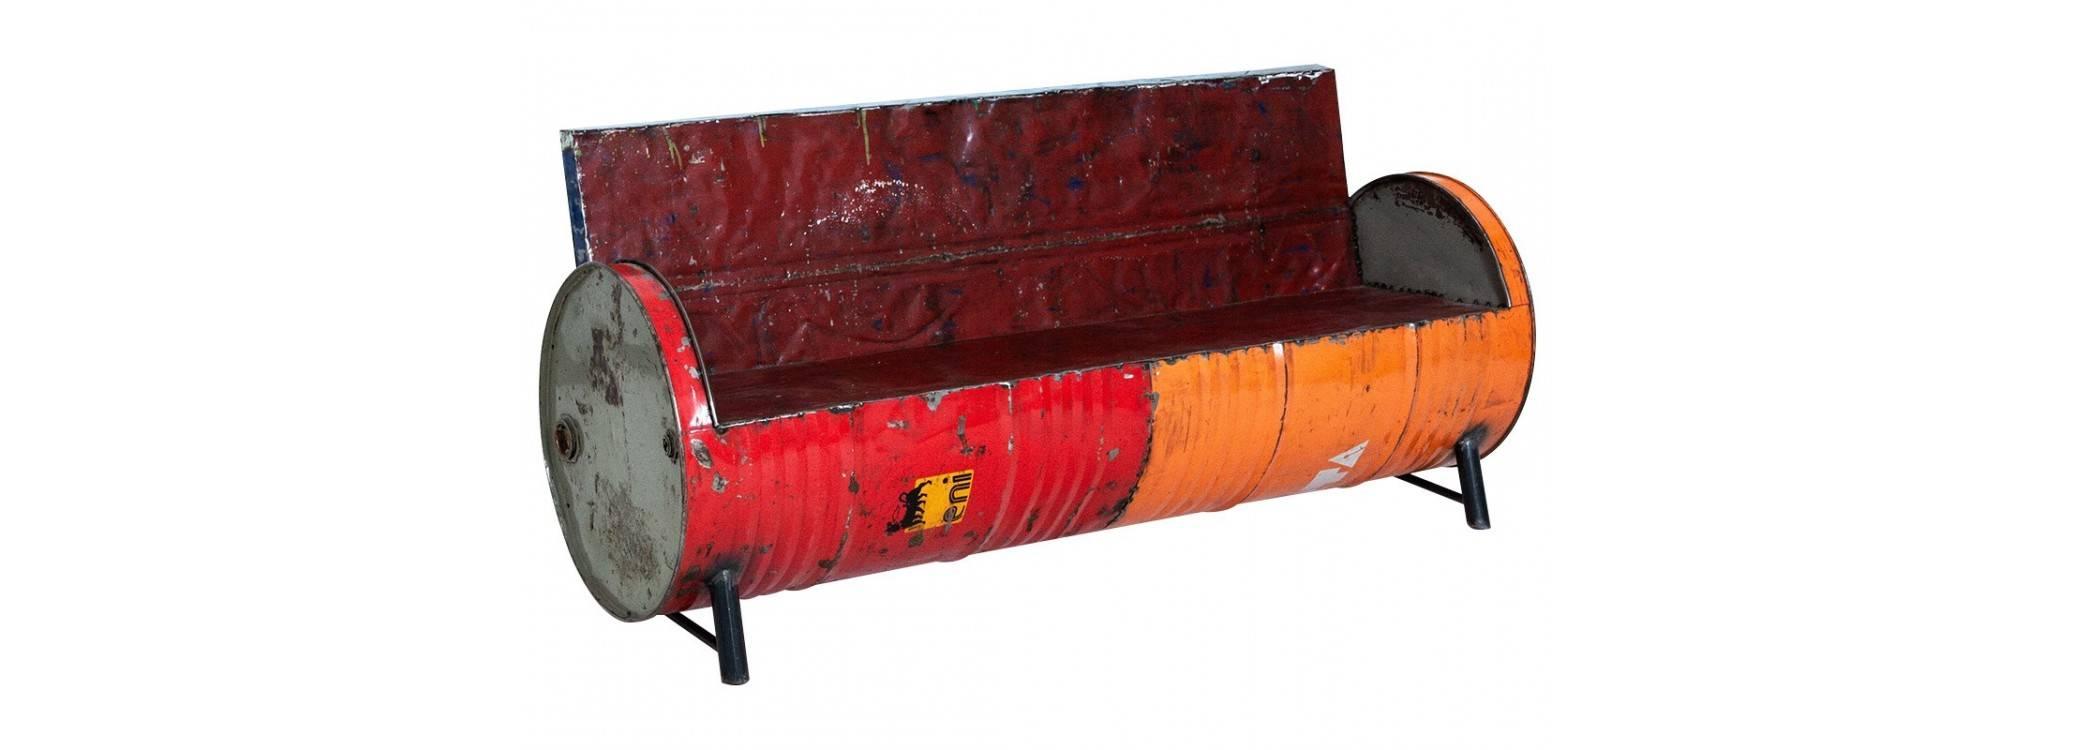 Canapé design conçu avec des bidons recyclés - 172 cm